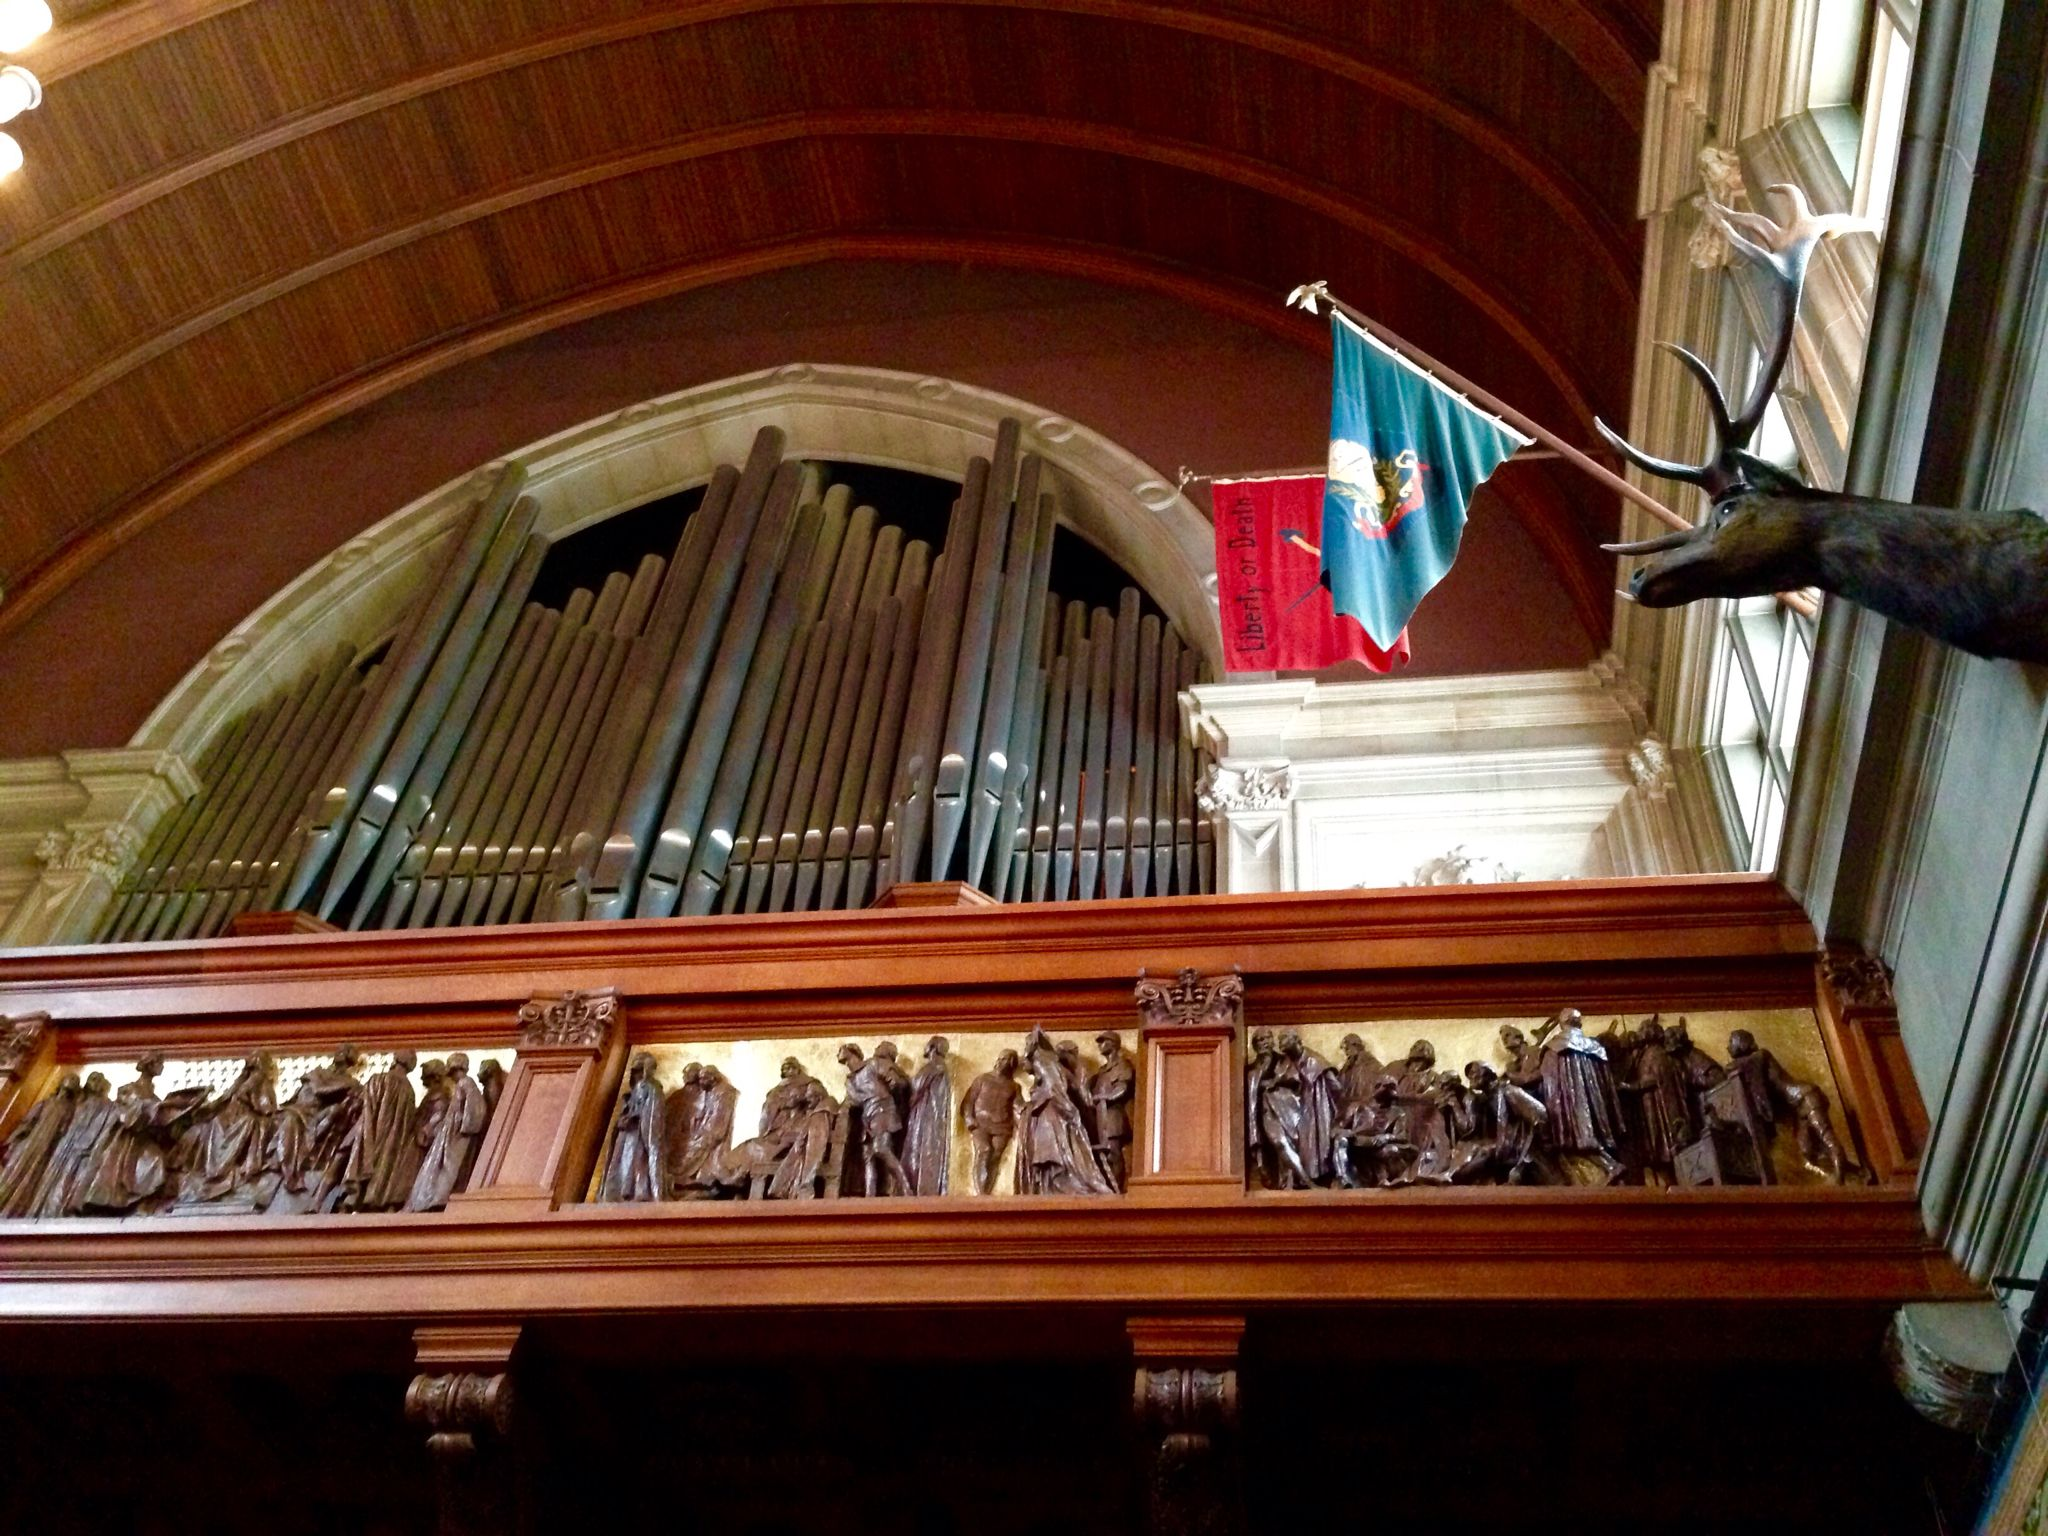 Biltmore House 2Nd Floor Organ Loft Above Banquet Hall -